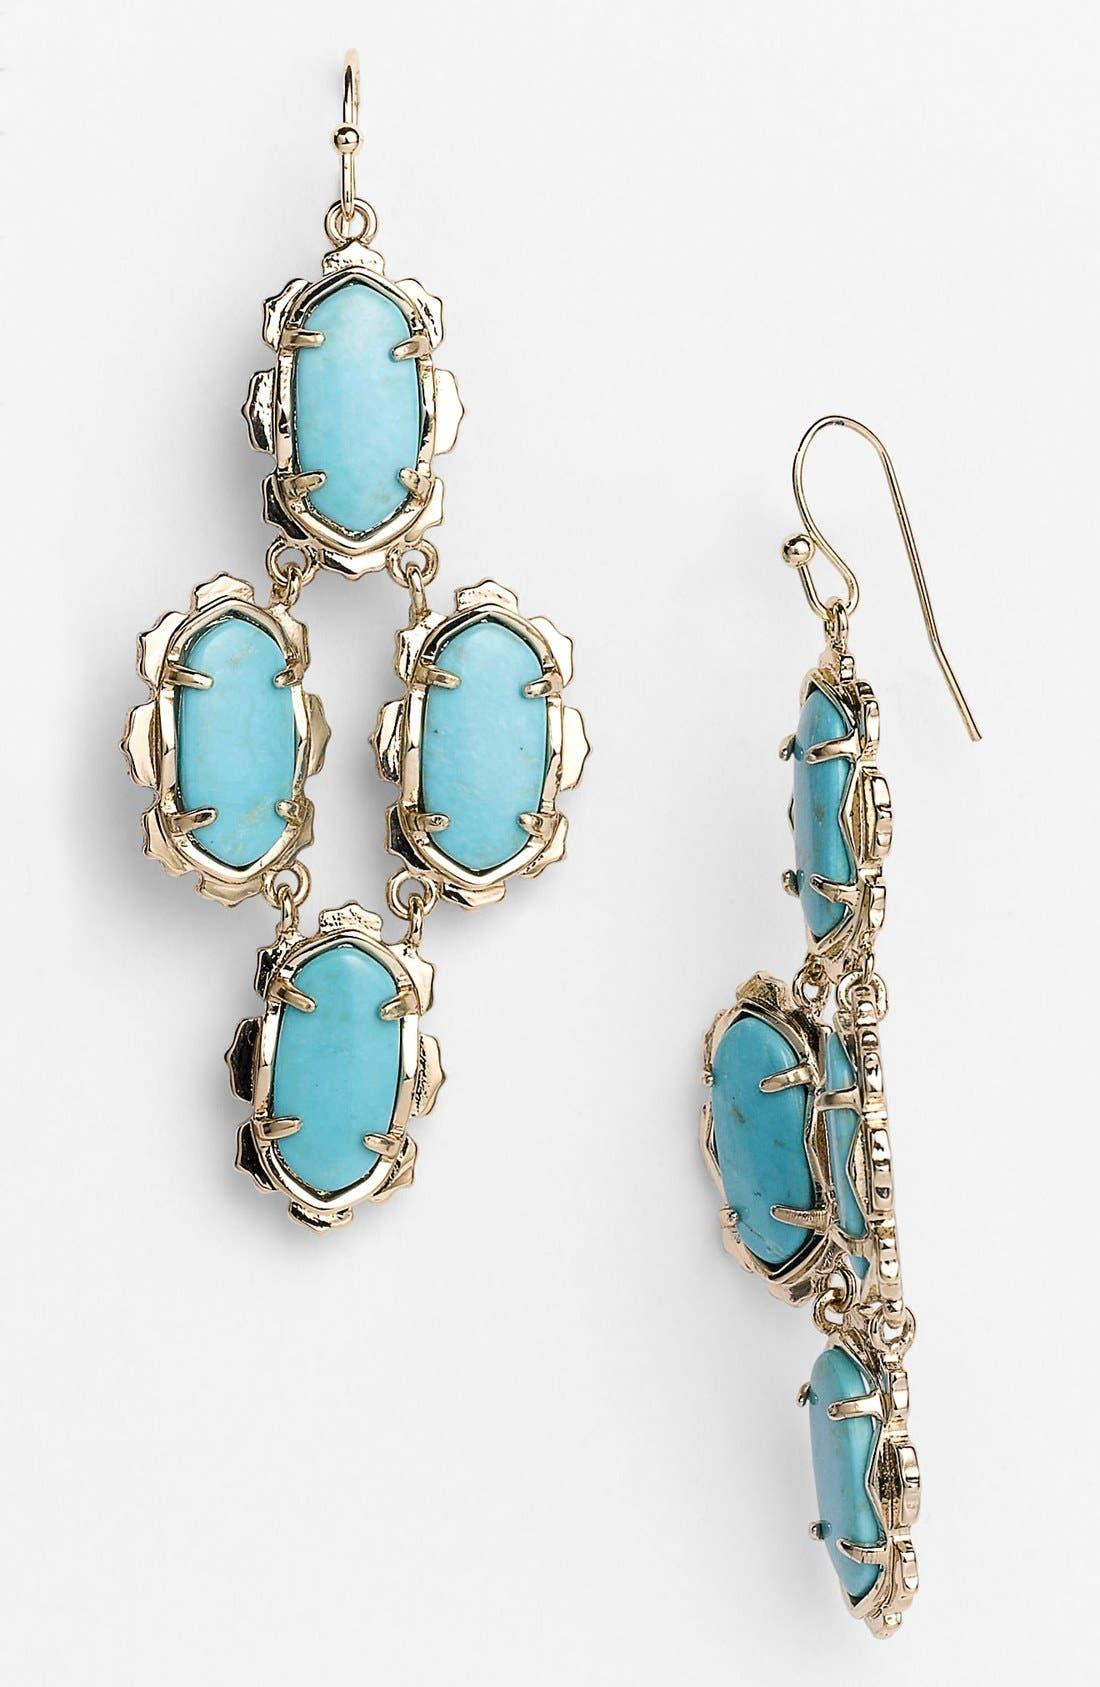 Alternate Image 1 Selected - Kendra Scott 'Carla' Oval Stone Earrings